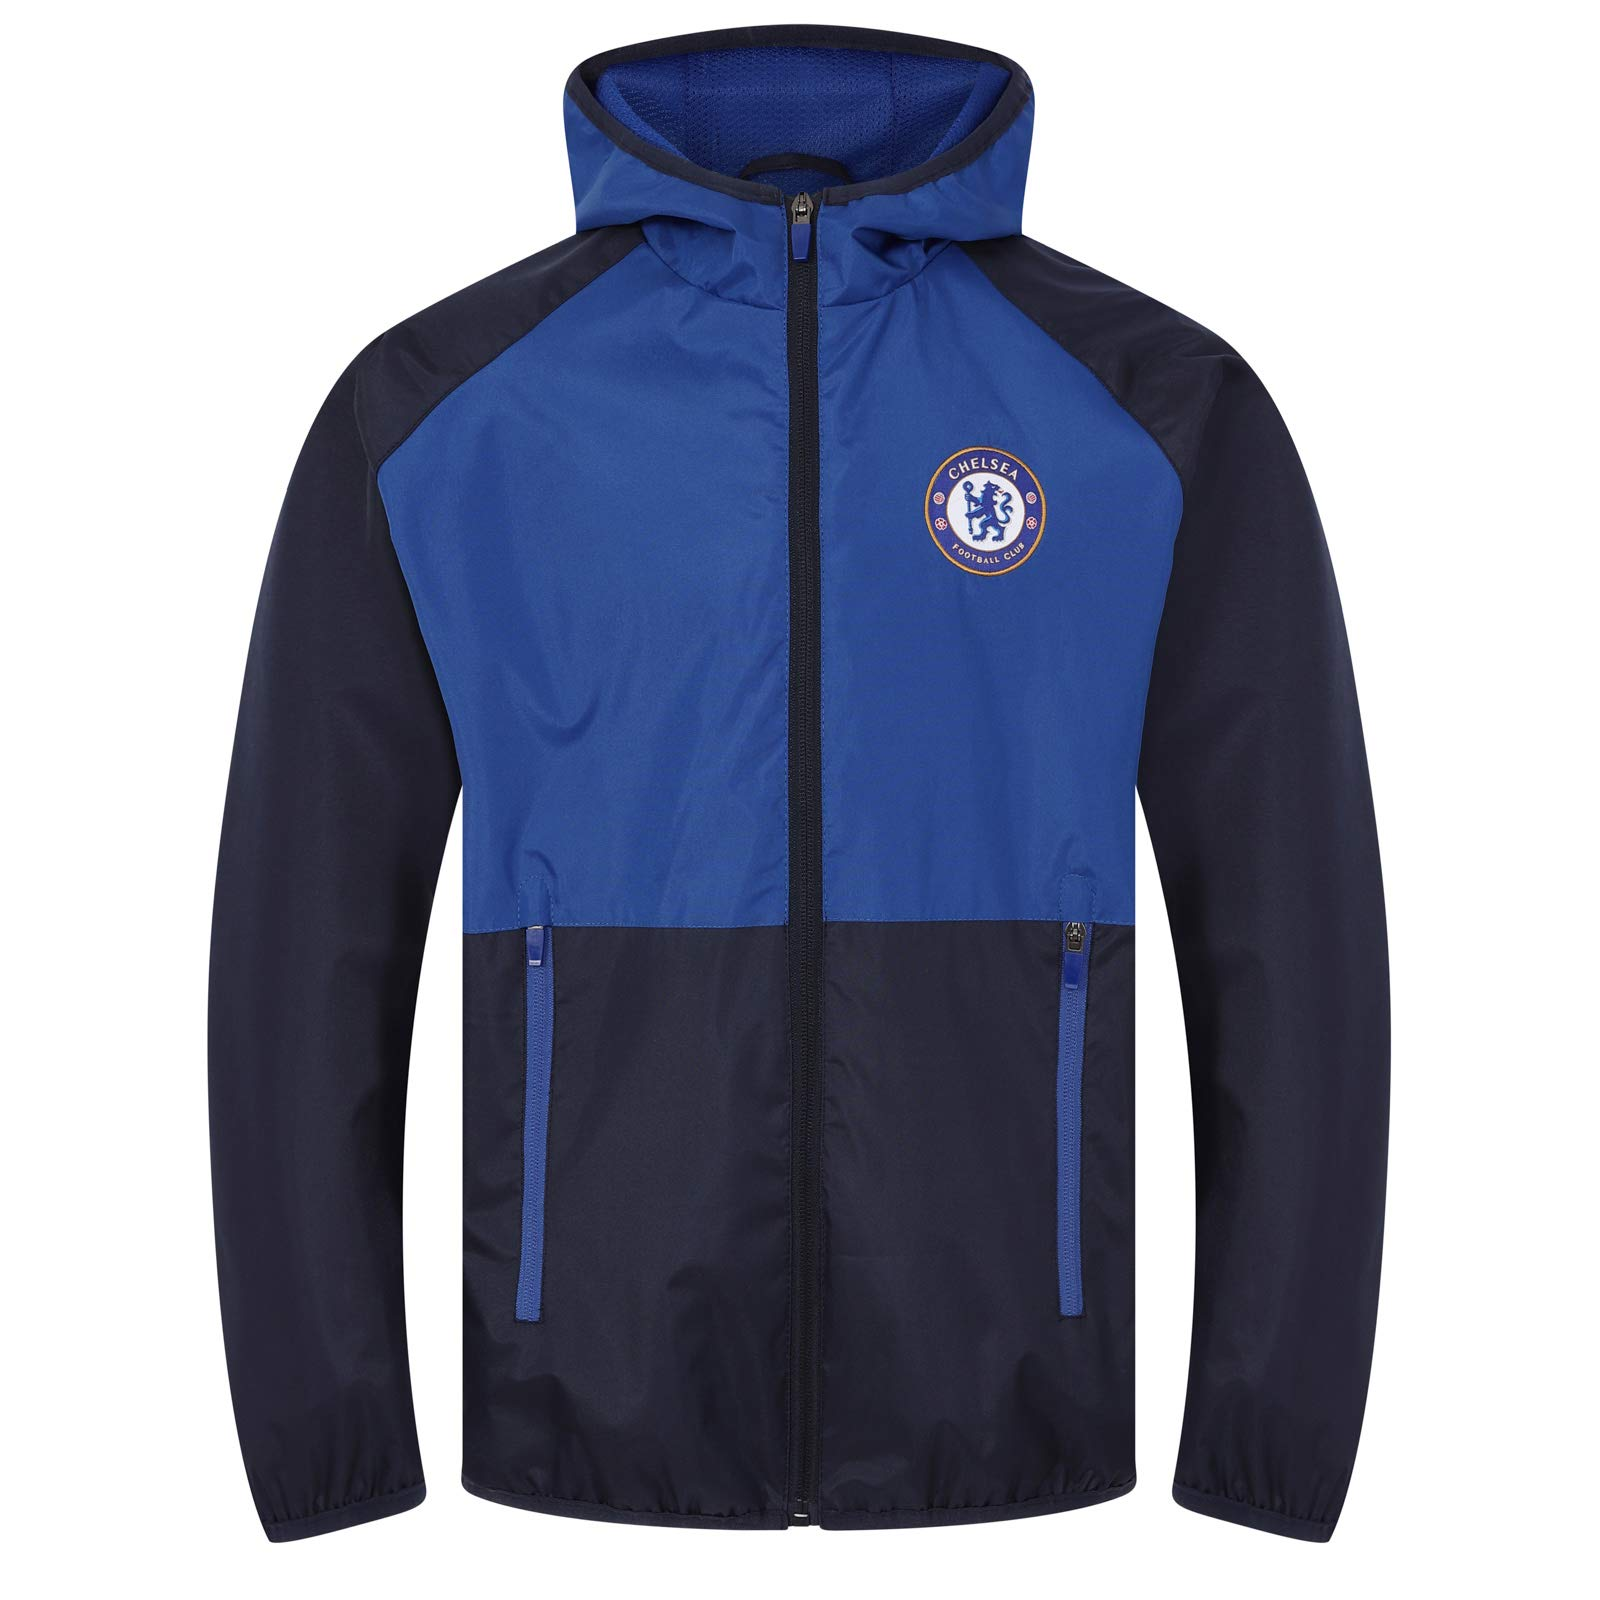 Chelsea FC Official Soccer Gift Boys Shower Jacket Windbreaker Navy 12-13 Yrs